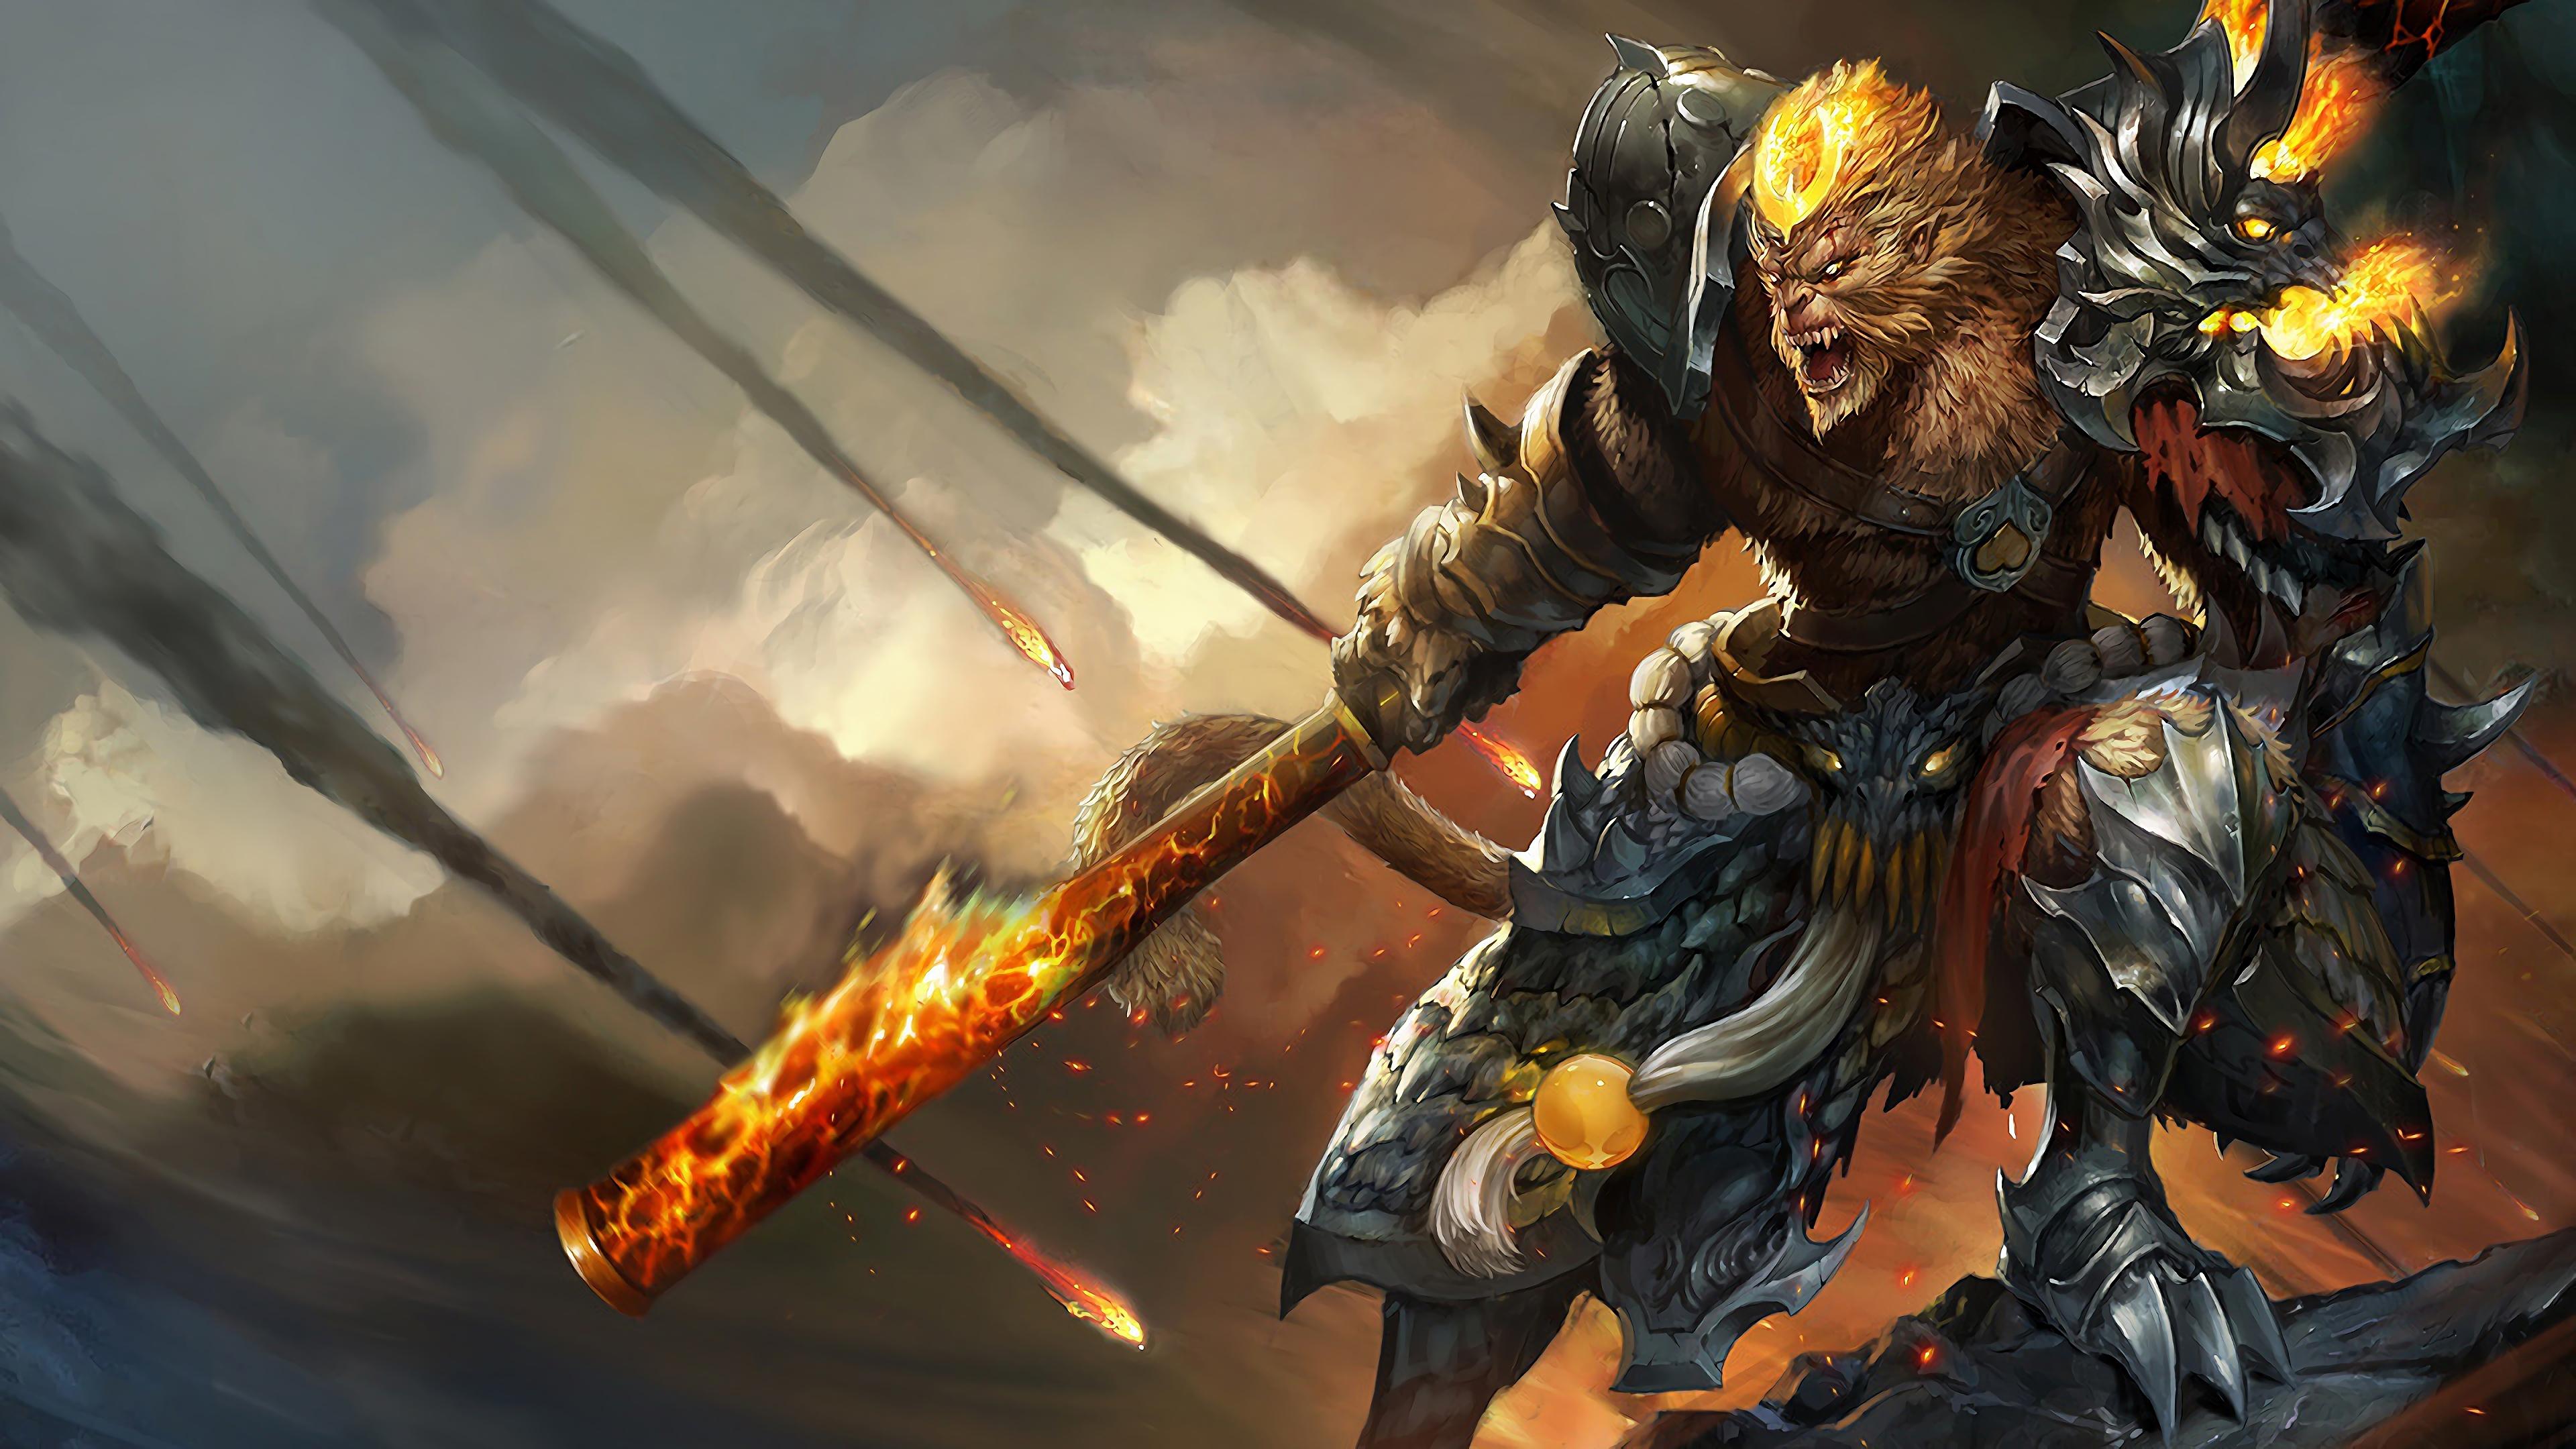 general wukong lol splash art league of legends 1574098191 - General Wukong LoL Splash Art League of Legends - Wukong, league of legends